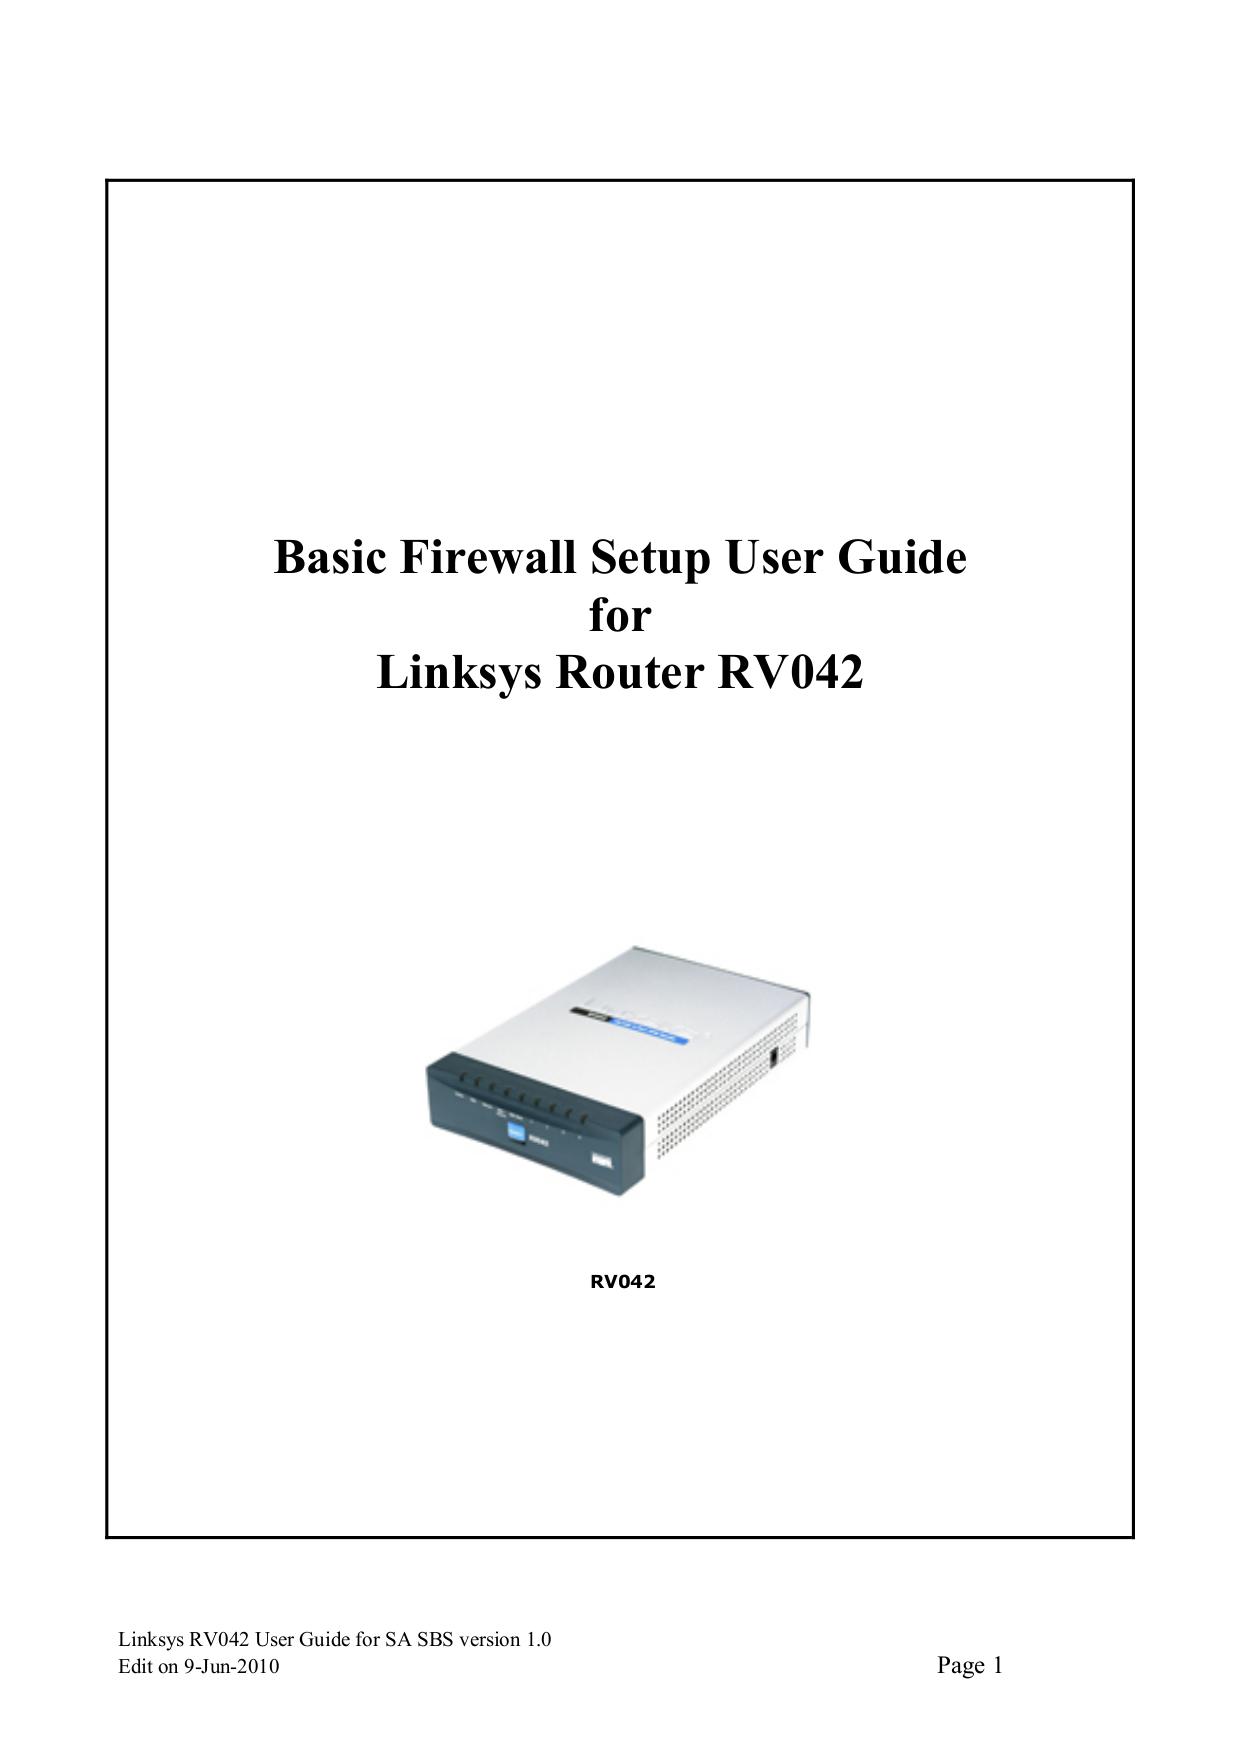 download free pdf for linksys rv042 router manual rh umlib com Linksys RV042 IP Address linksys rv042 manual pdf